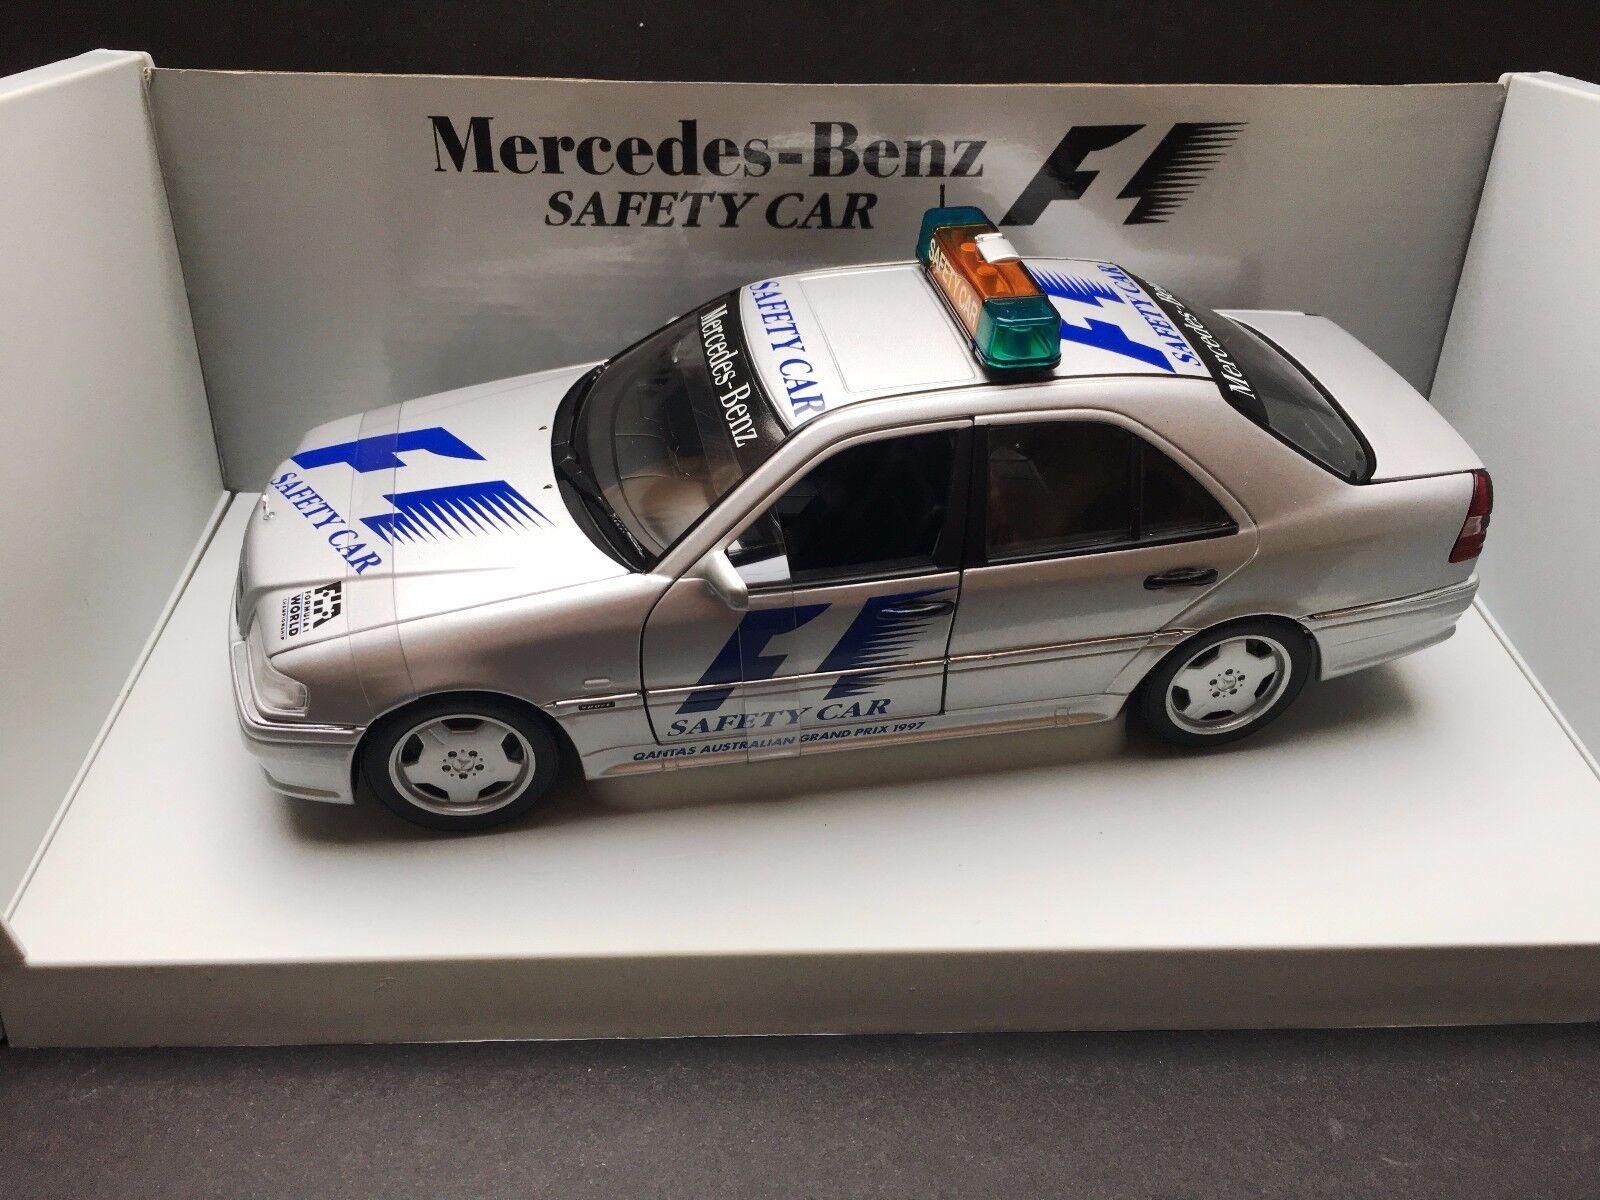 Universal Hobbies - Safety Car -Mercedes AMG C Class - 1 18 -1997 -Australian GP